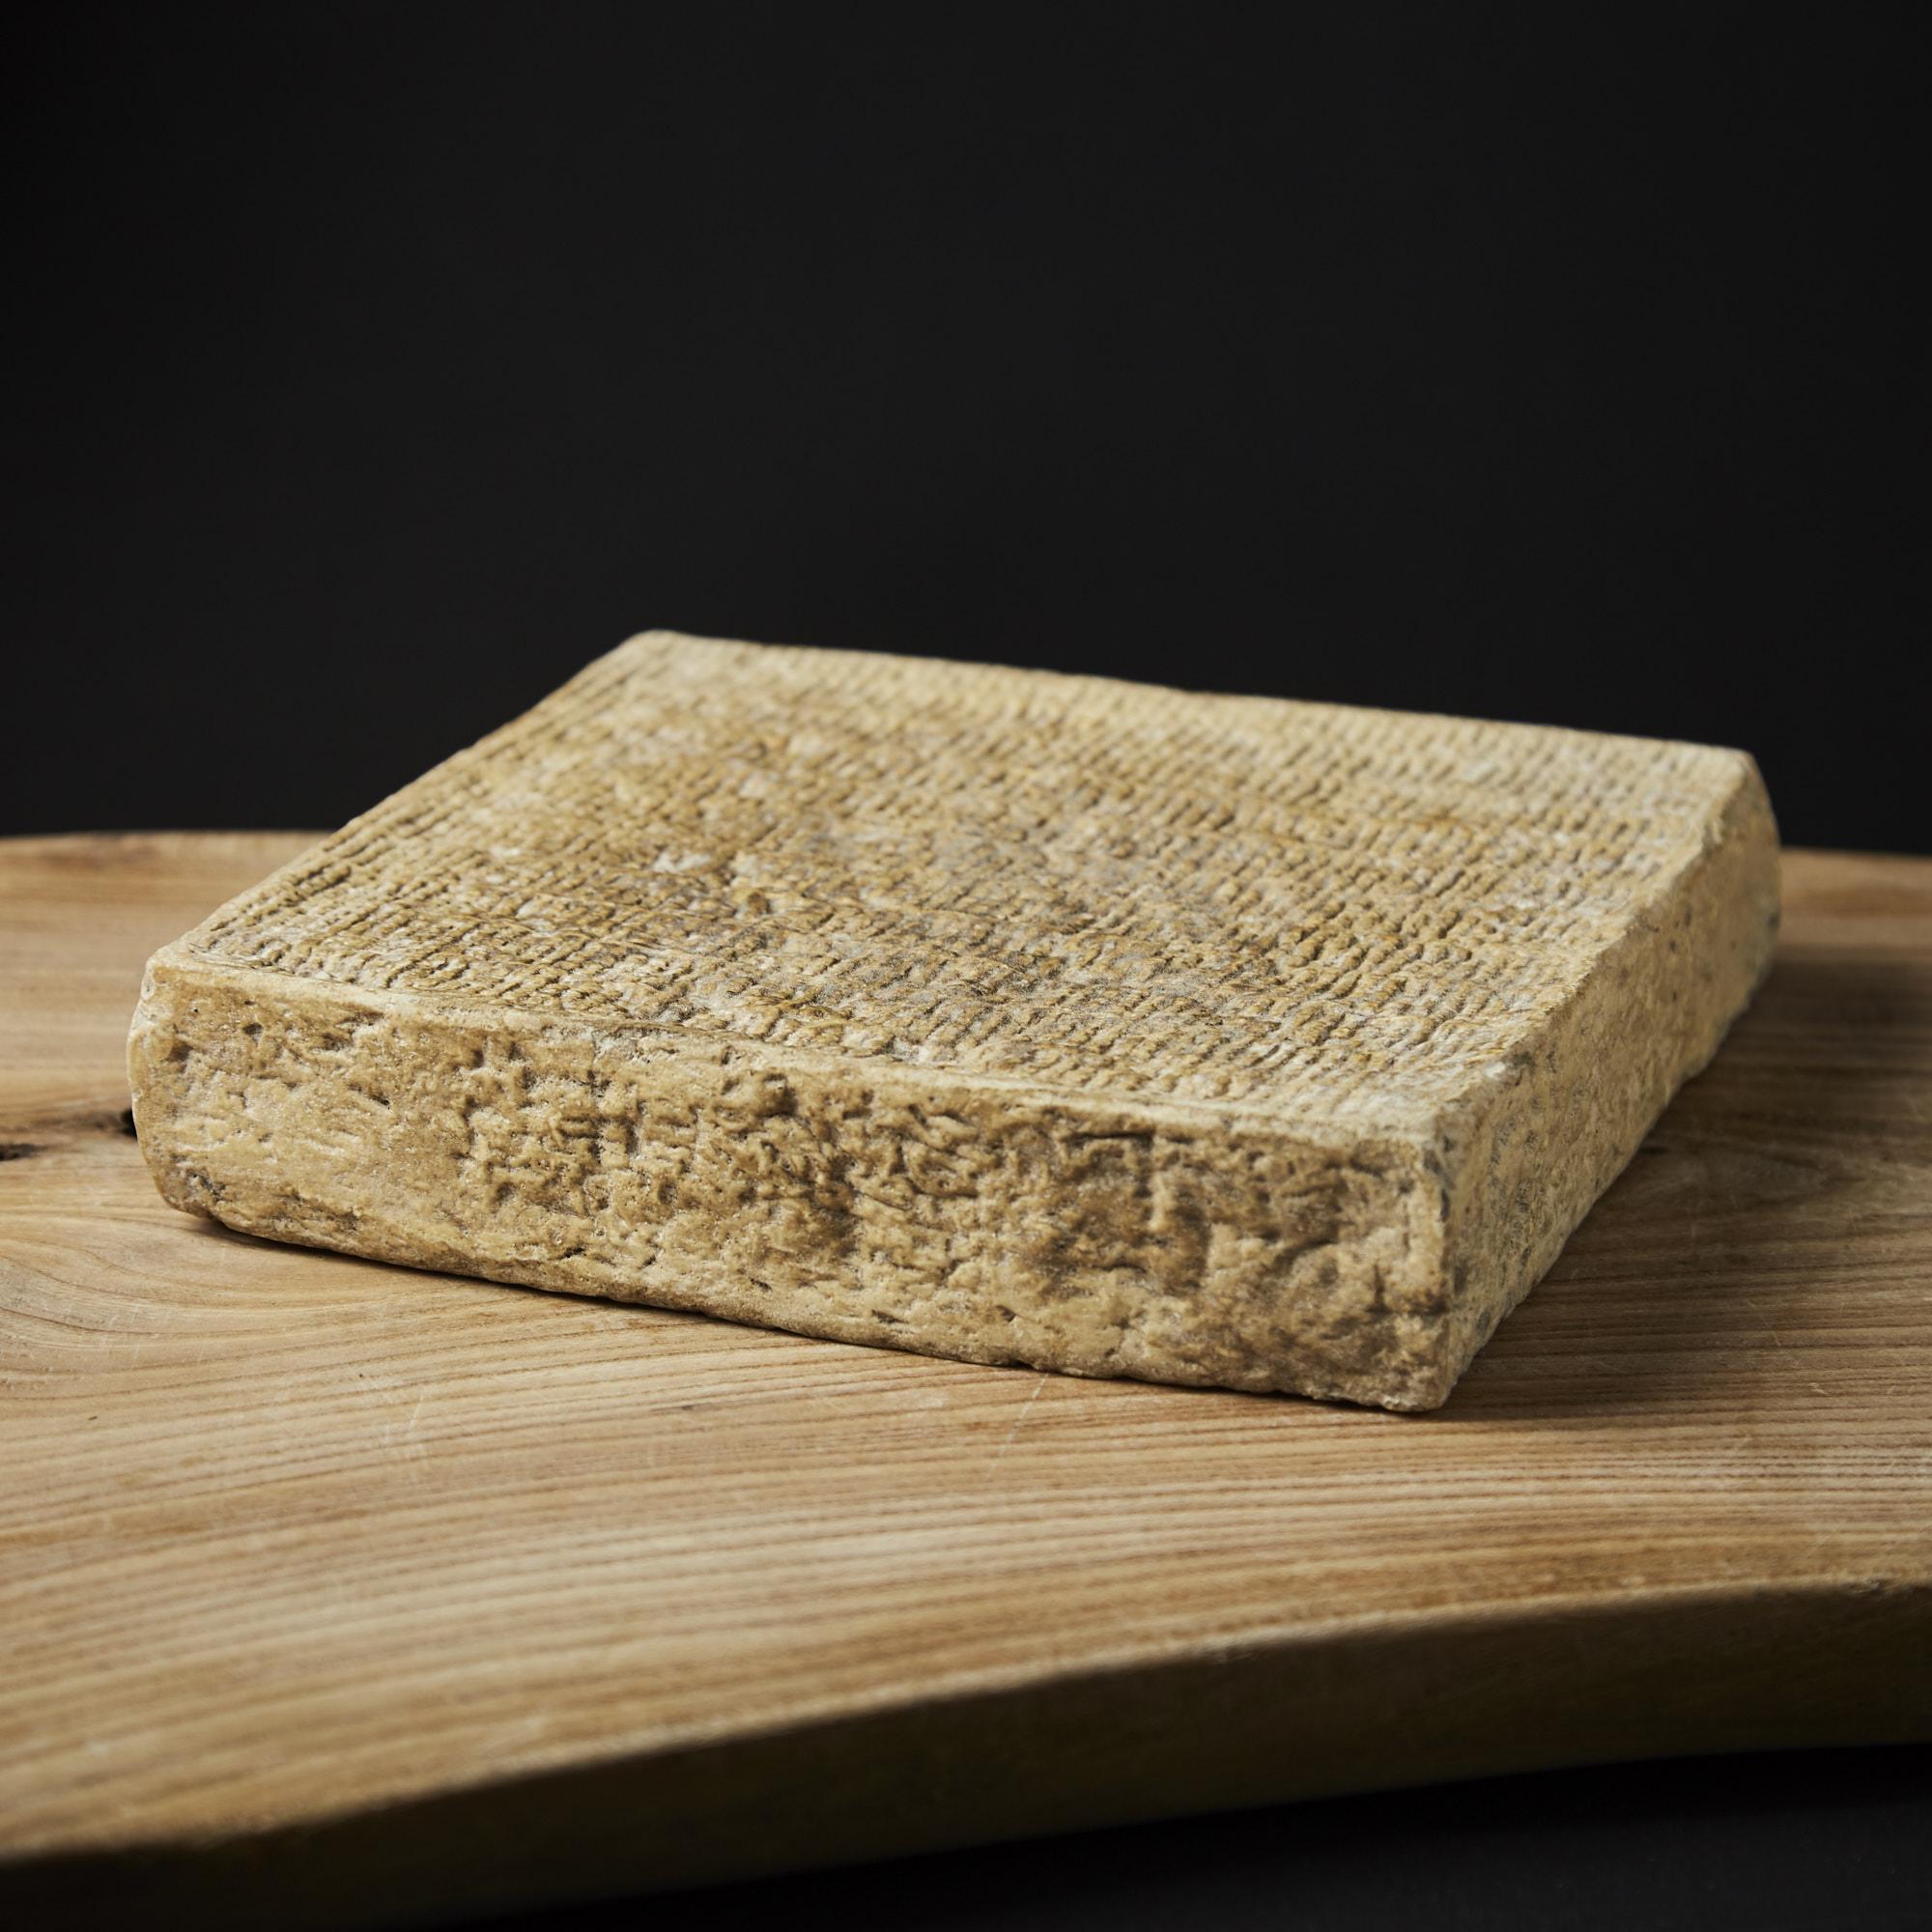 pecorino crosta lavata